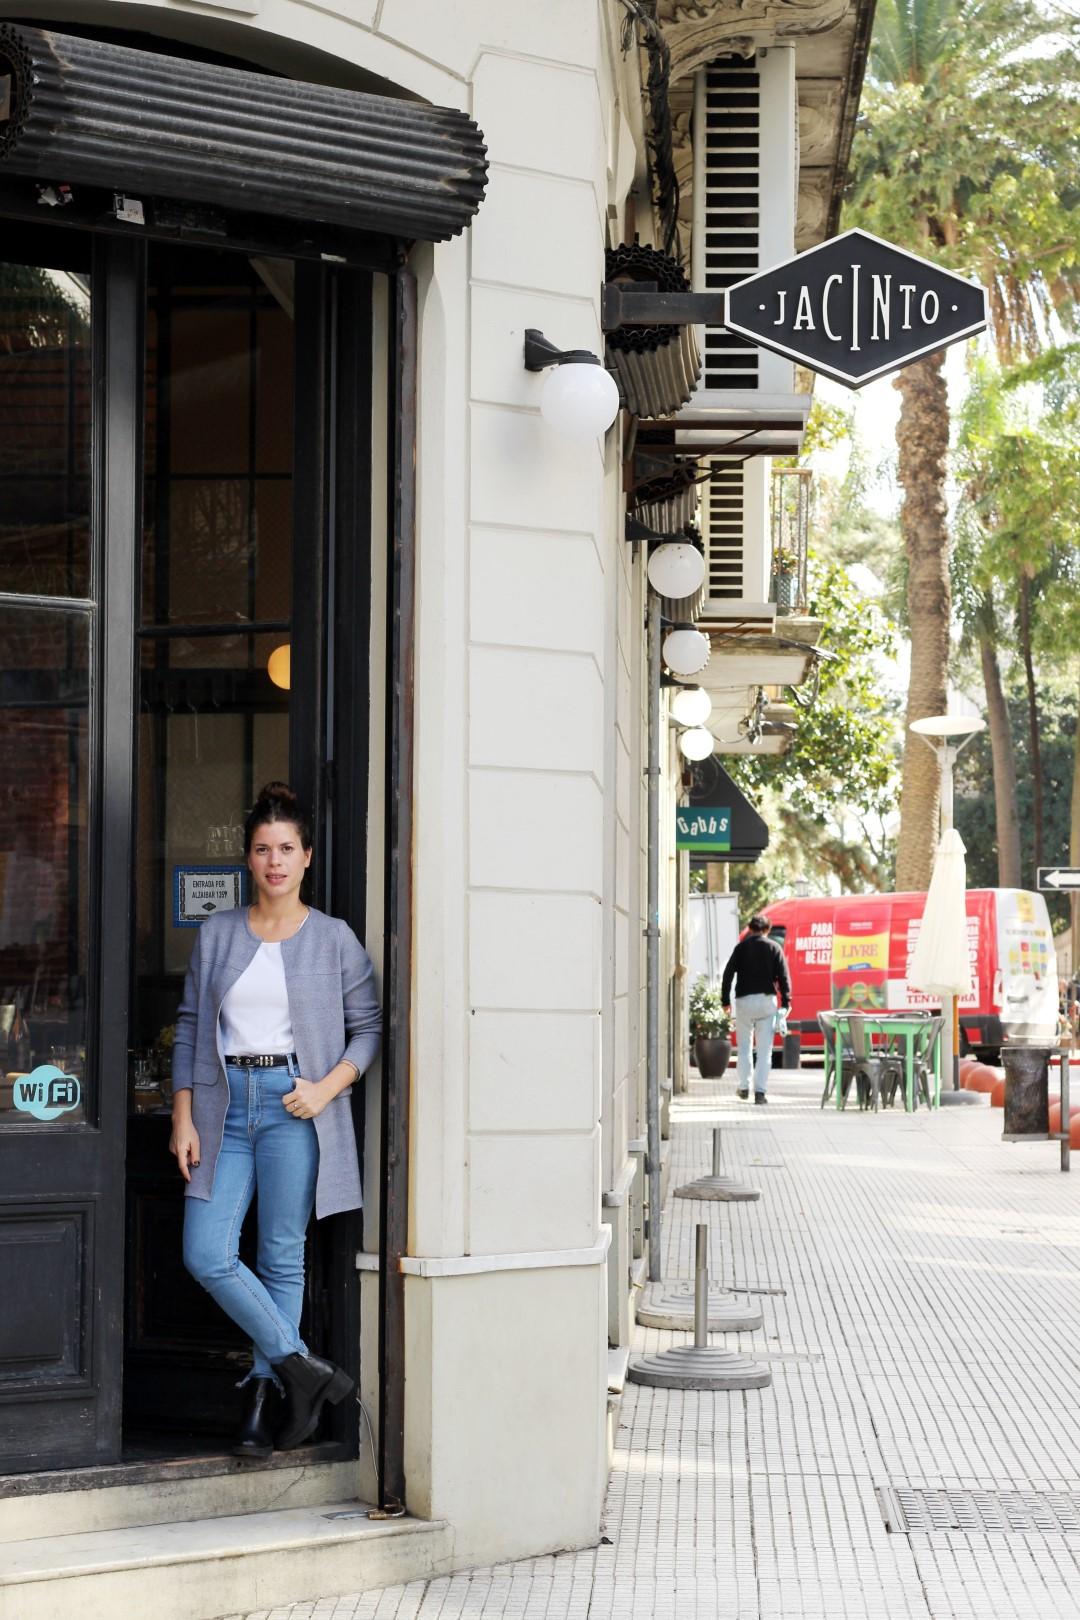 Lucia Soria Masterchef Jacinto